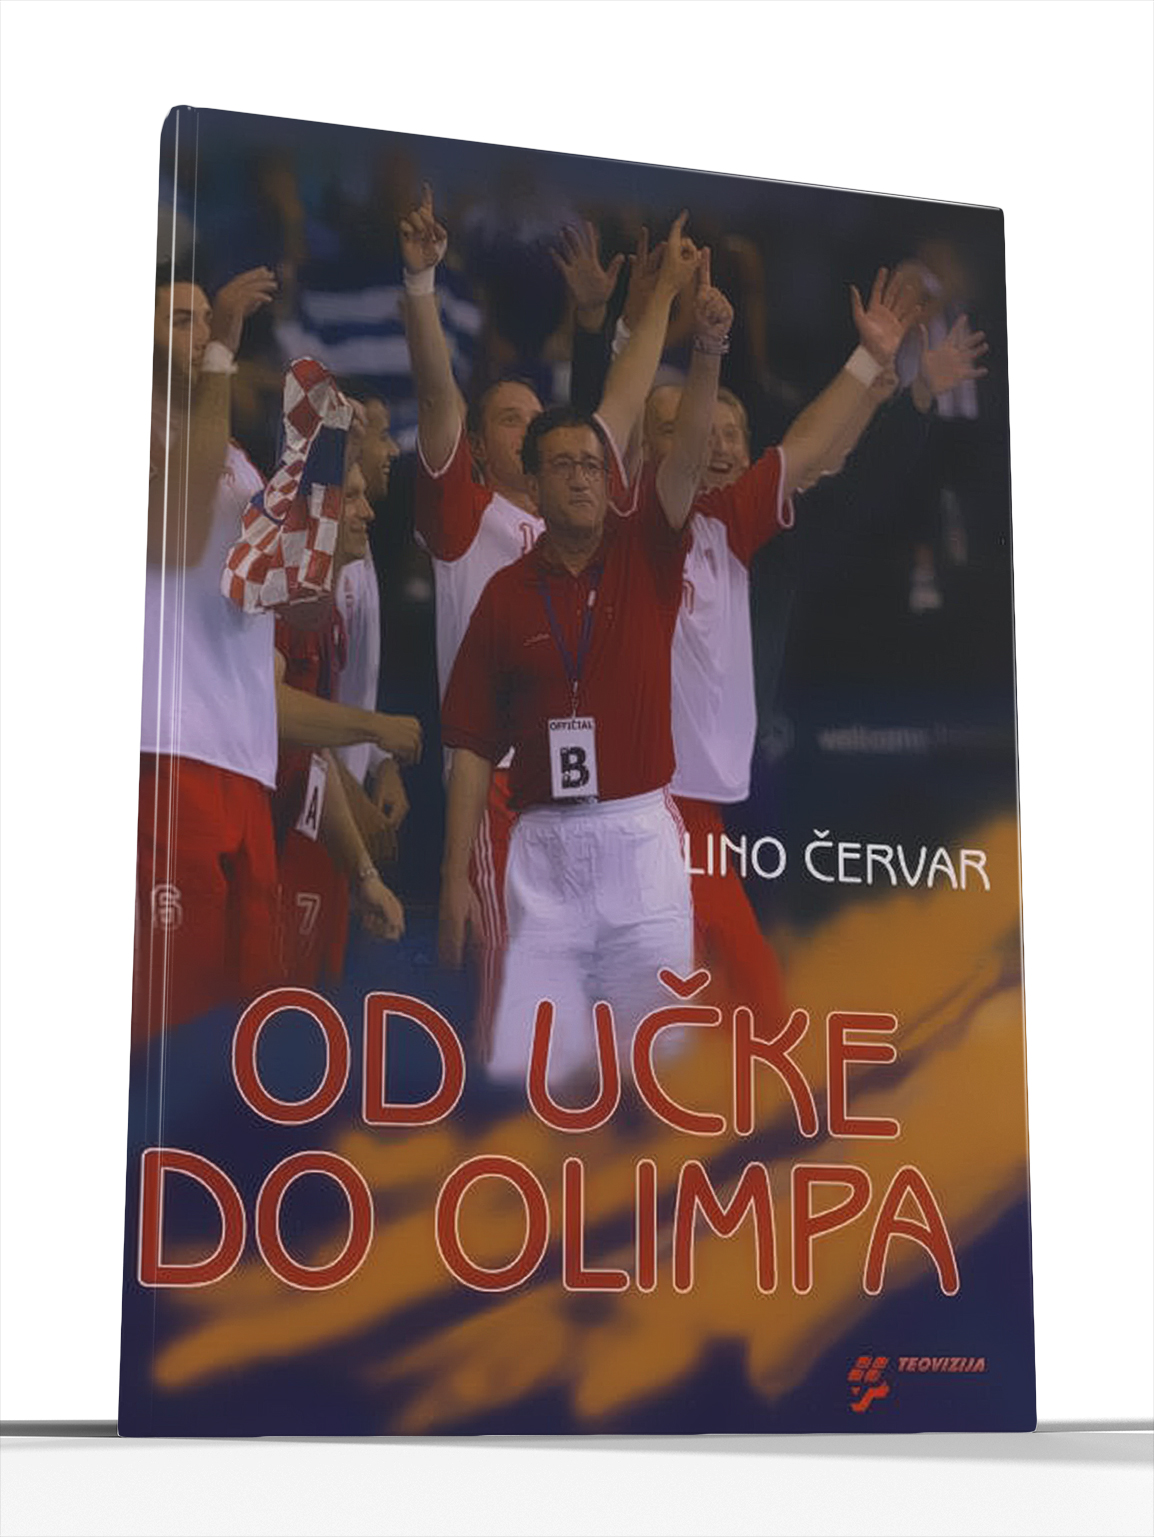 OD UČKE DO OLIMPA - Lino Červar